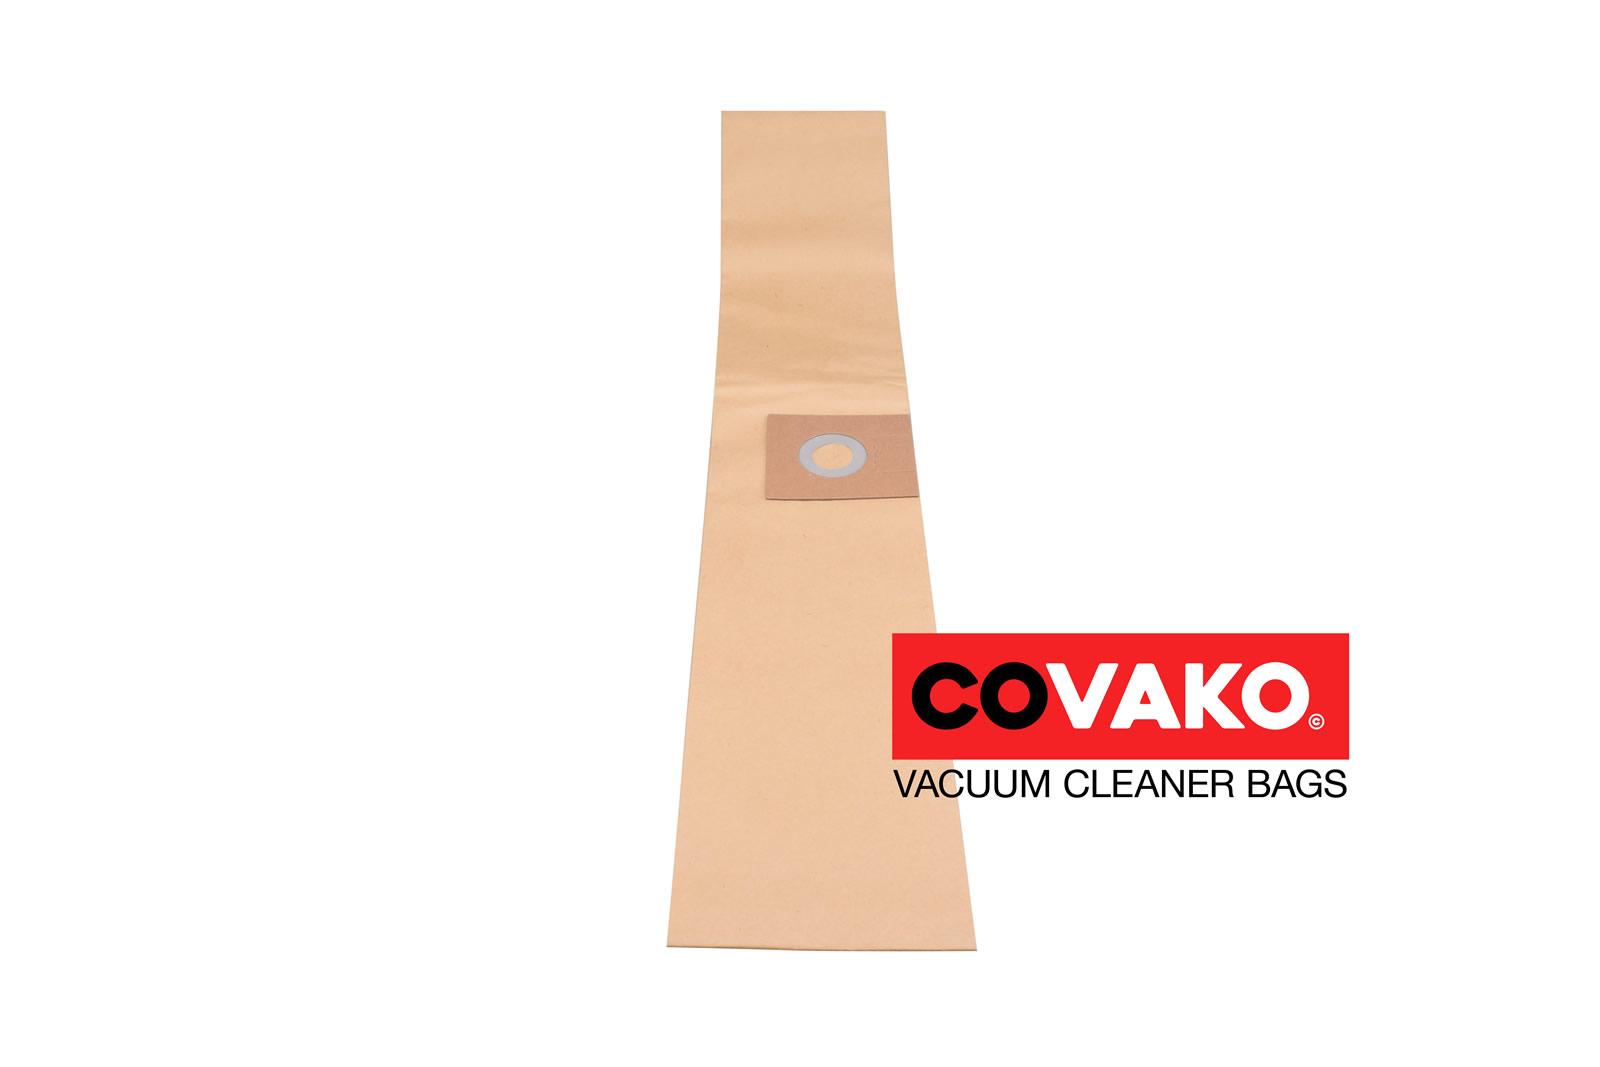 Kenter Micro S / Papier - Kenter stofzuigerzakken